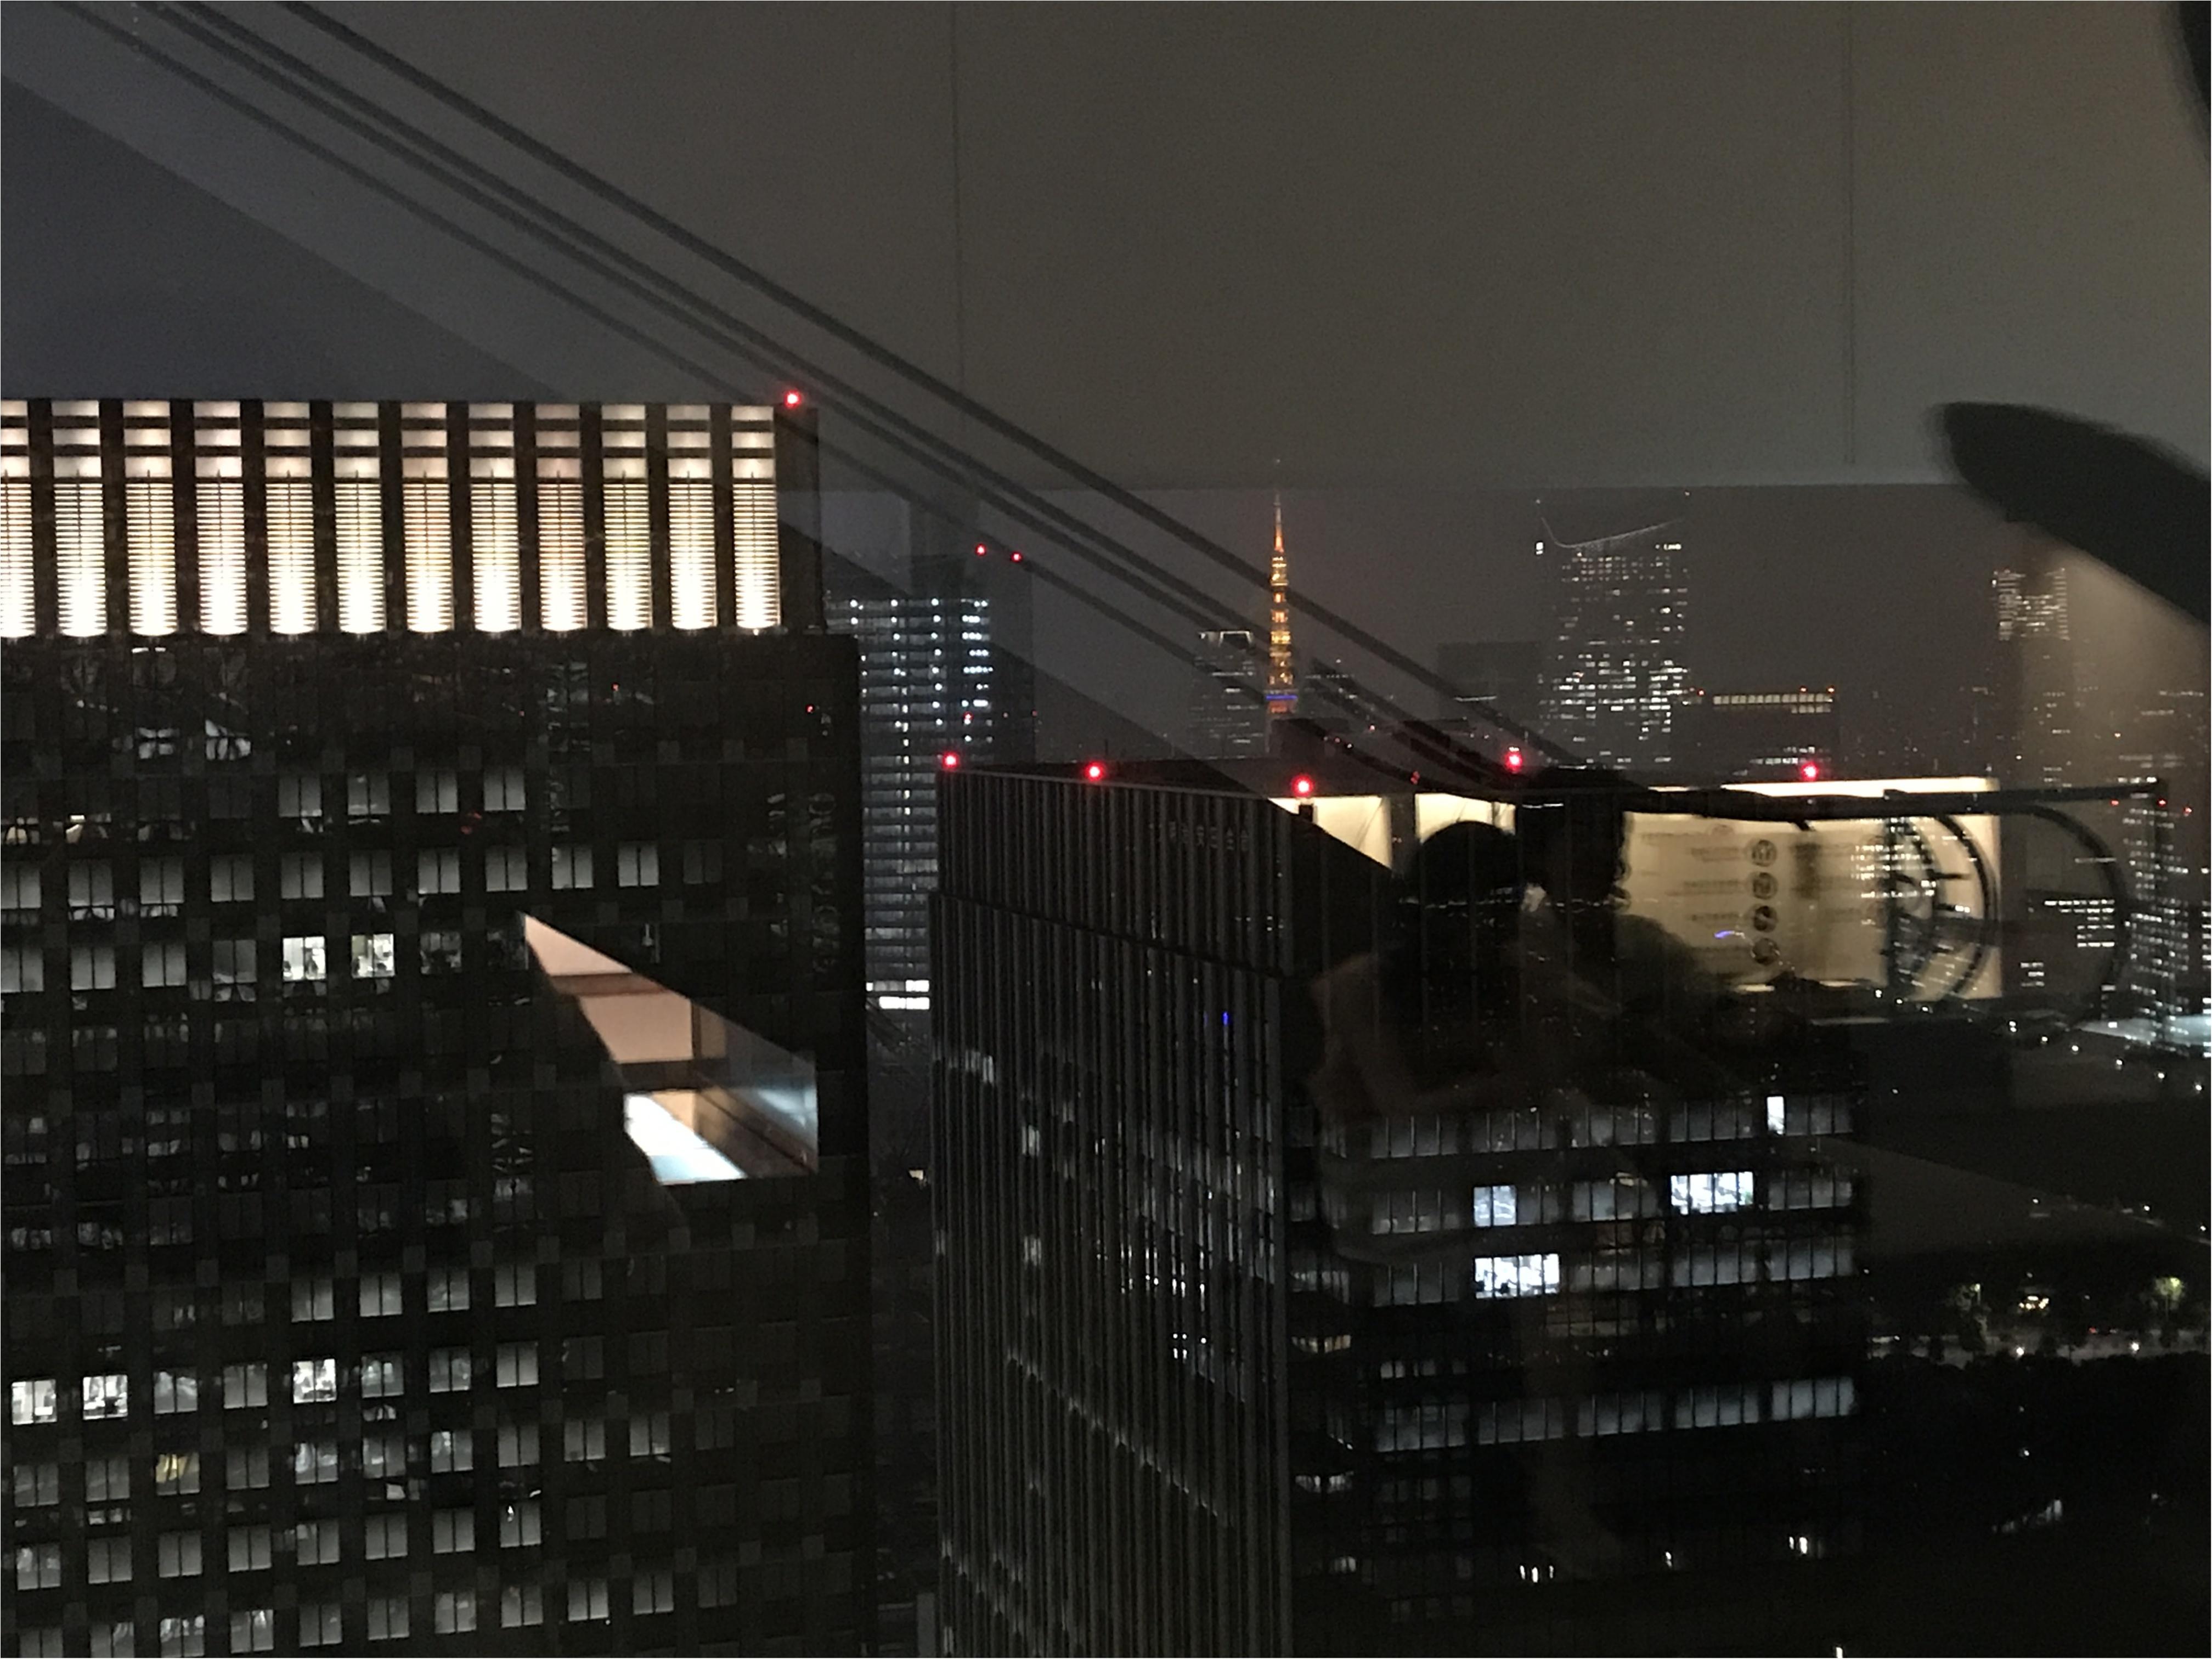 【AUXAMIS TOKYO】東京駅丸ビル35階絶景のフレンチレストランで誕生日ディナー♡_3